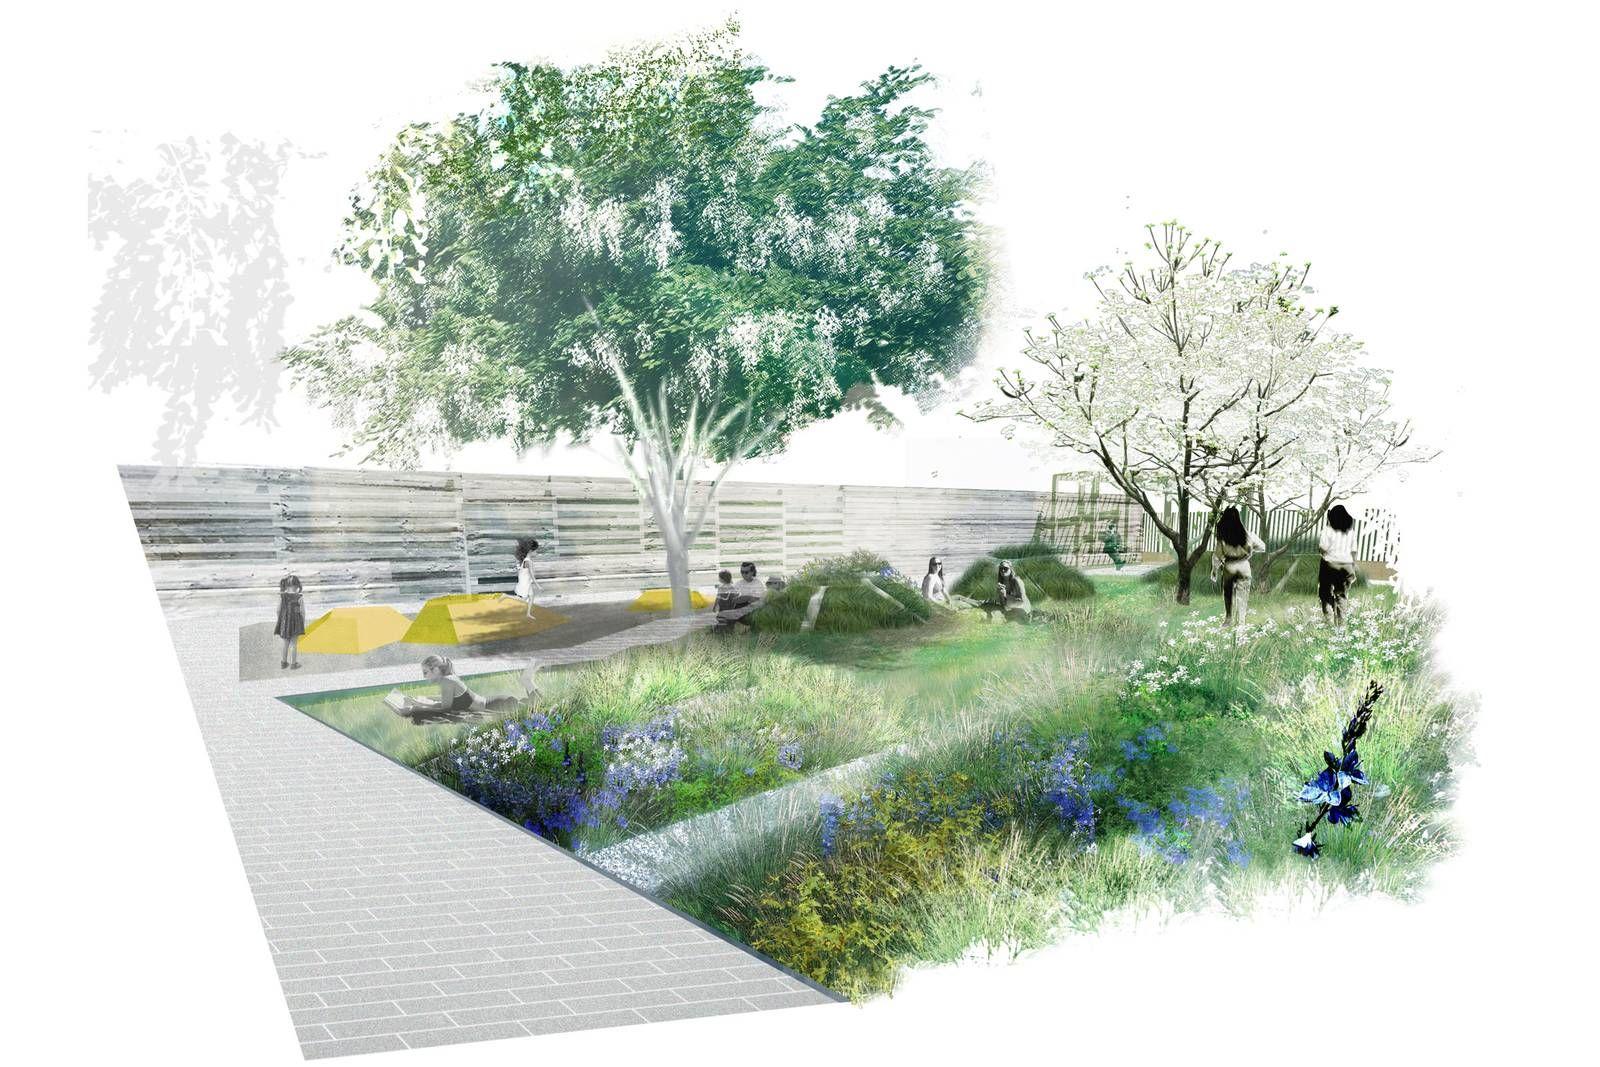 Landscape architecture perspective drawings interior design for Greeninc landscape architecture